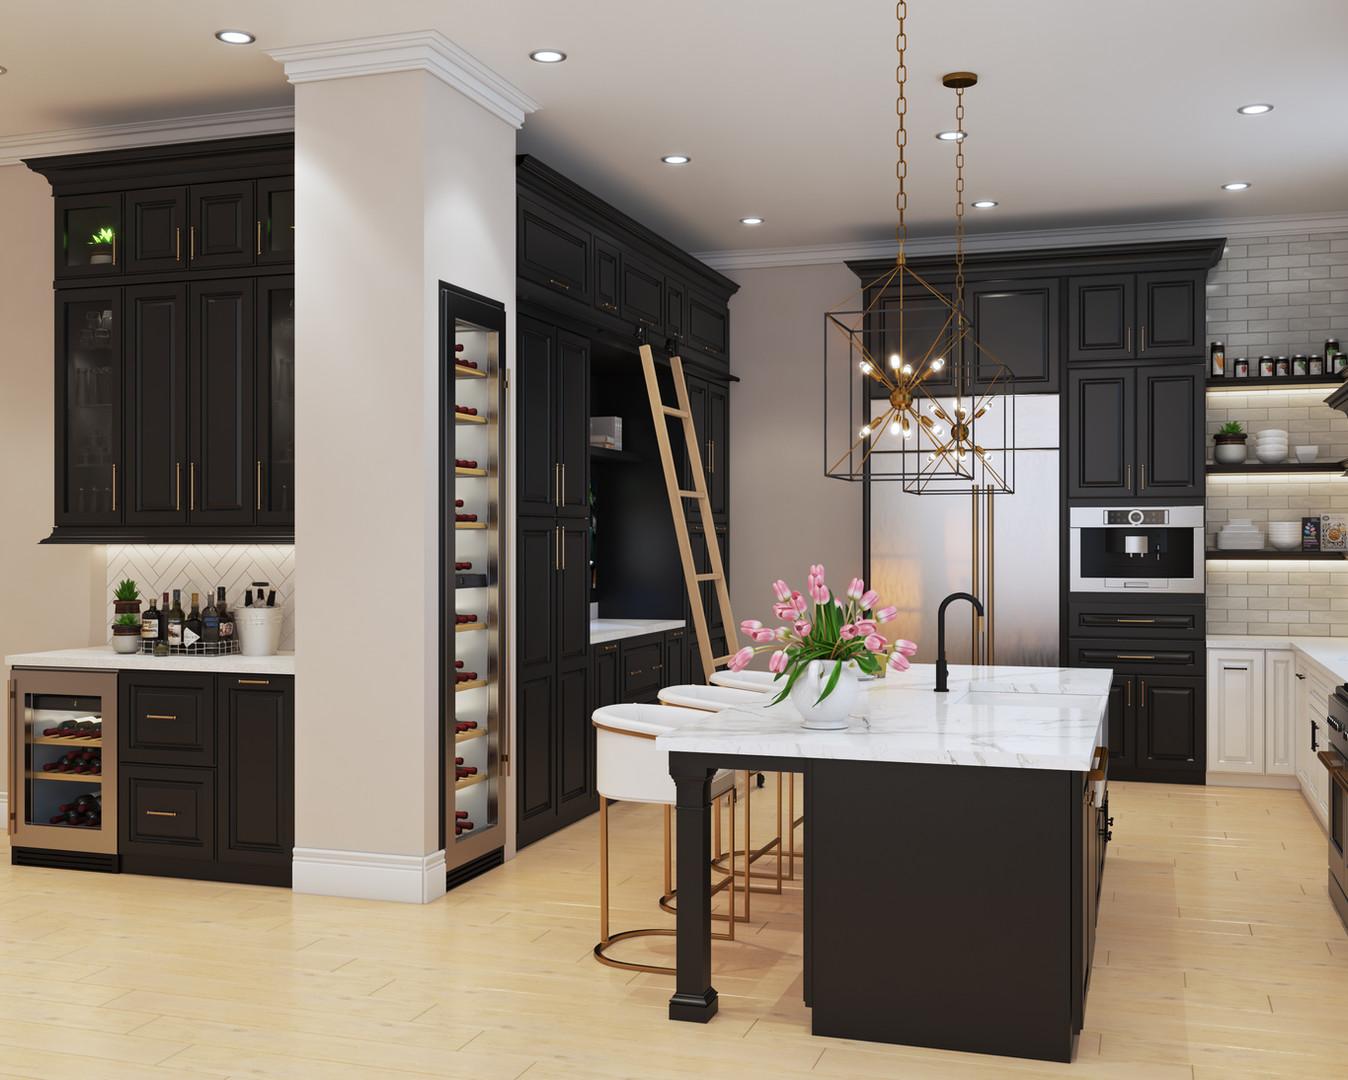 Professionally Designed Artisan Kitchens